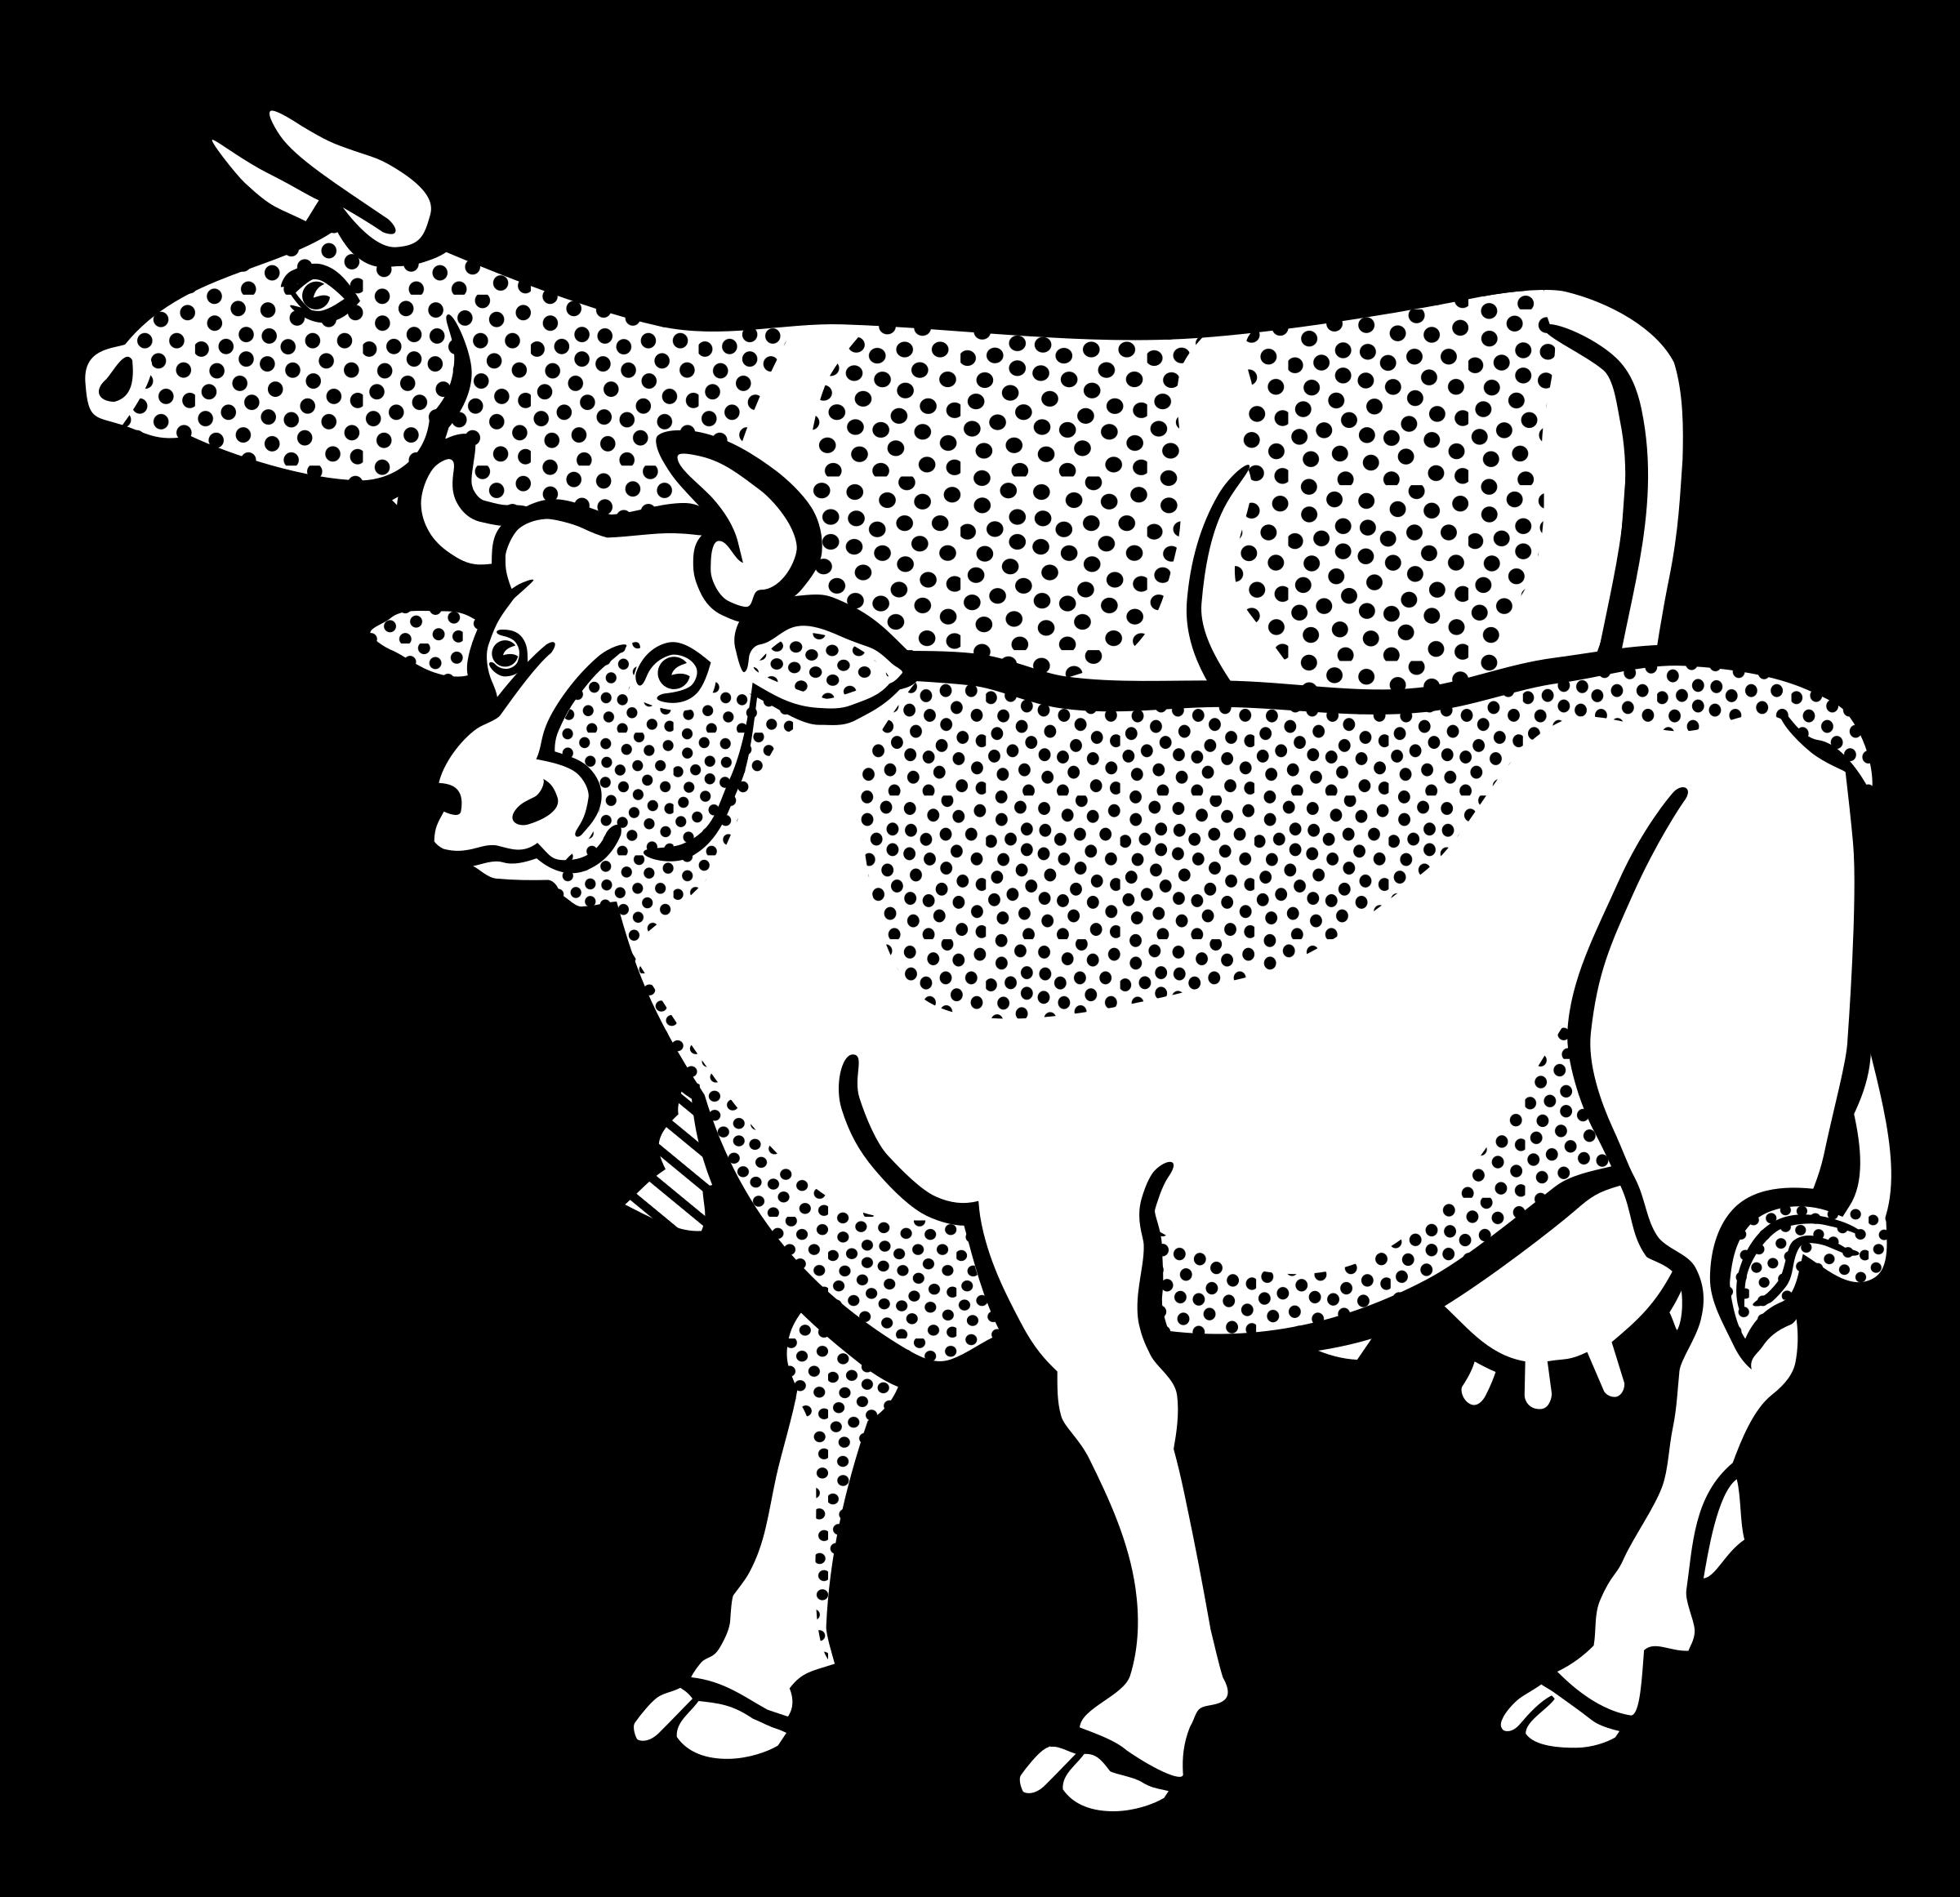 Cows clipart gambar. Lineart big image png